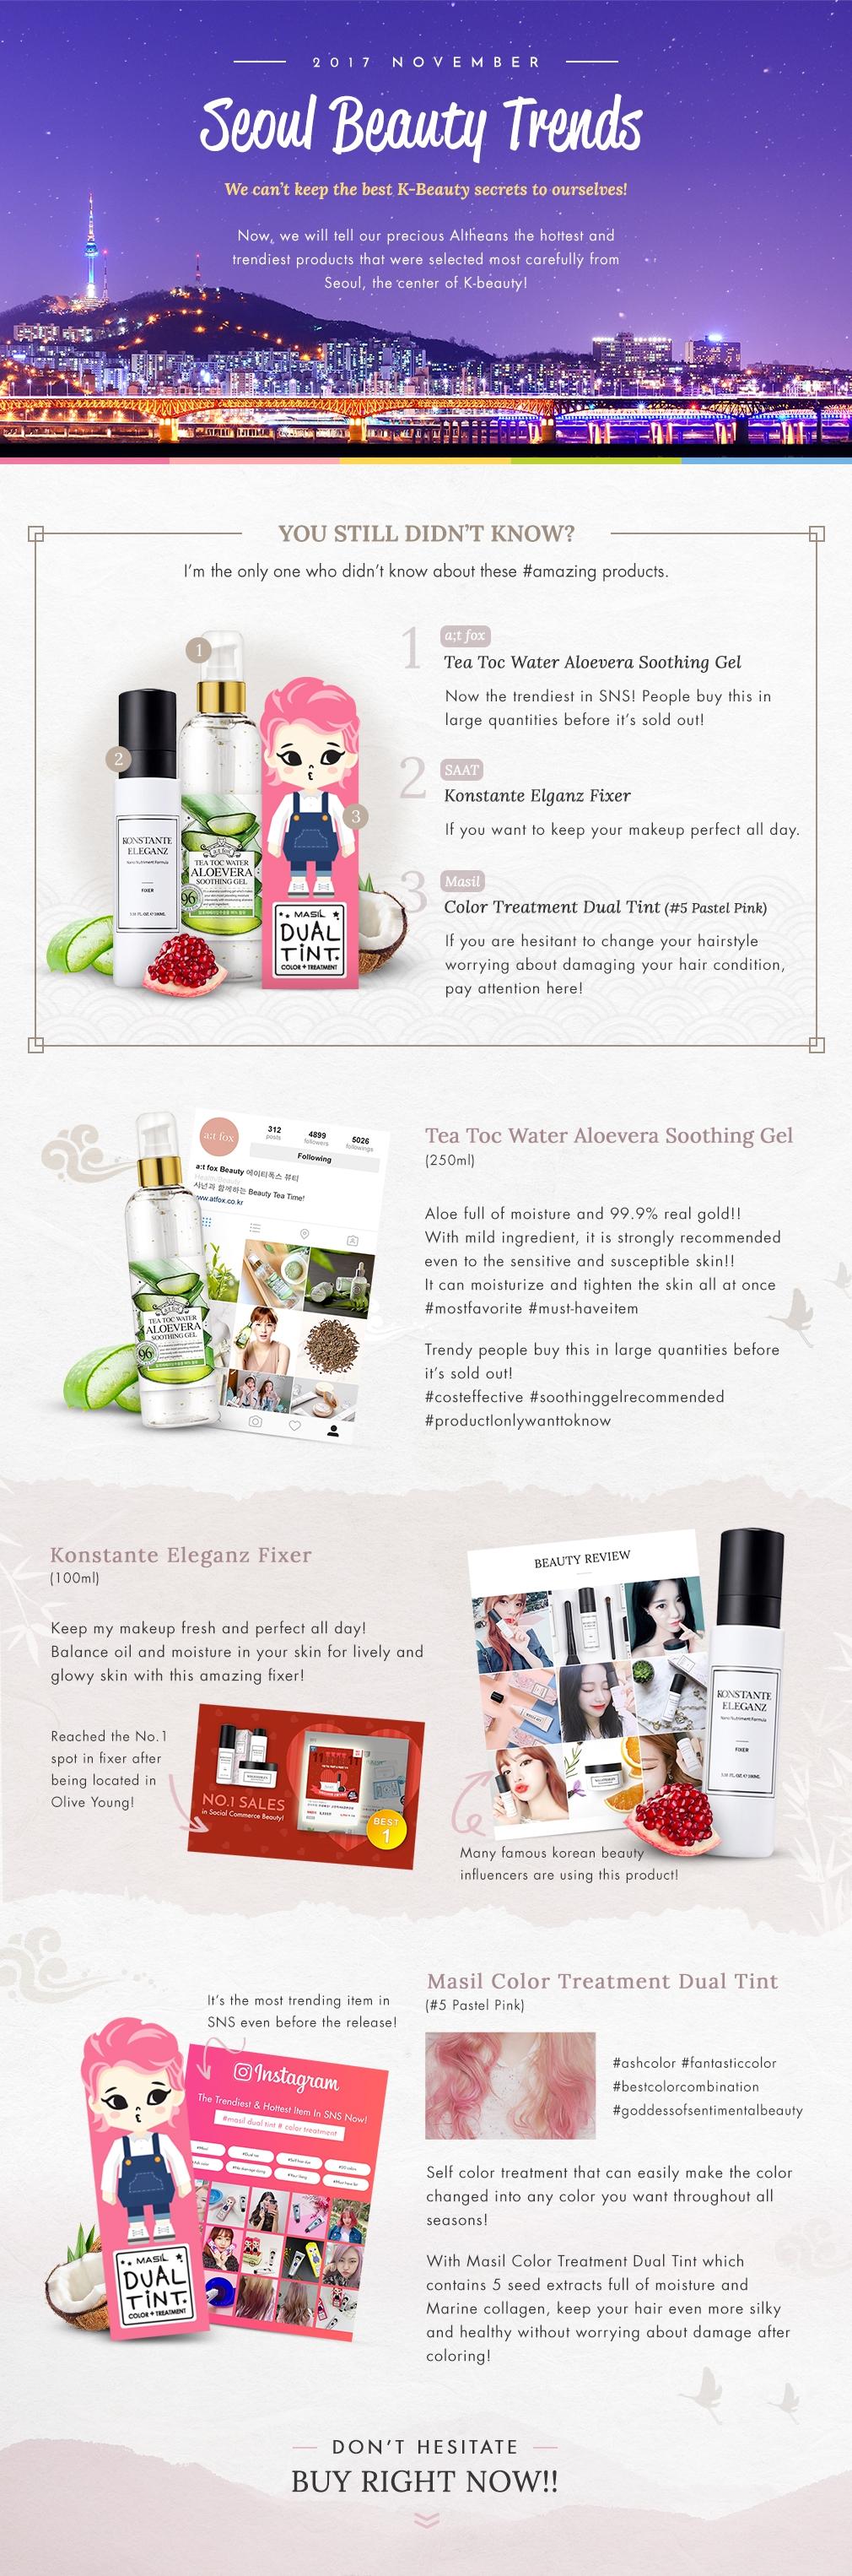 Seoul Beauty Trends_Nov